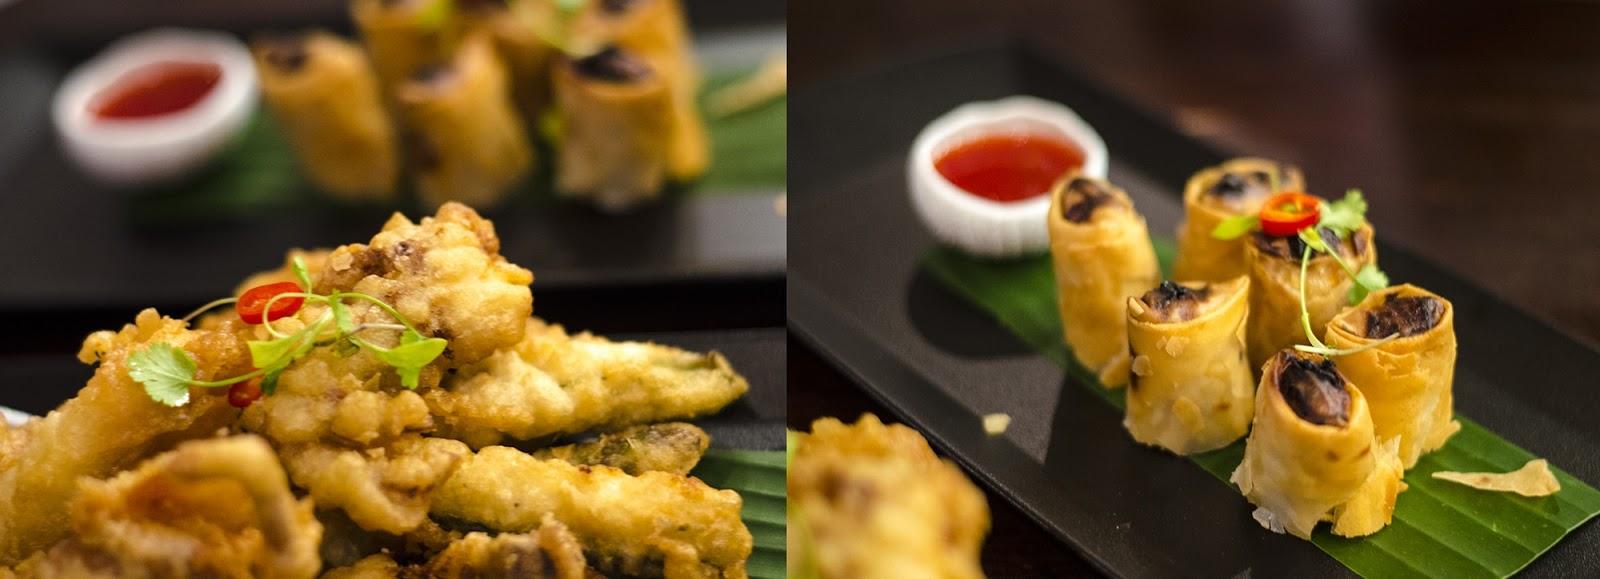 Chaophraya Menu Review: soft shell crab and squid tempura